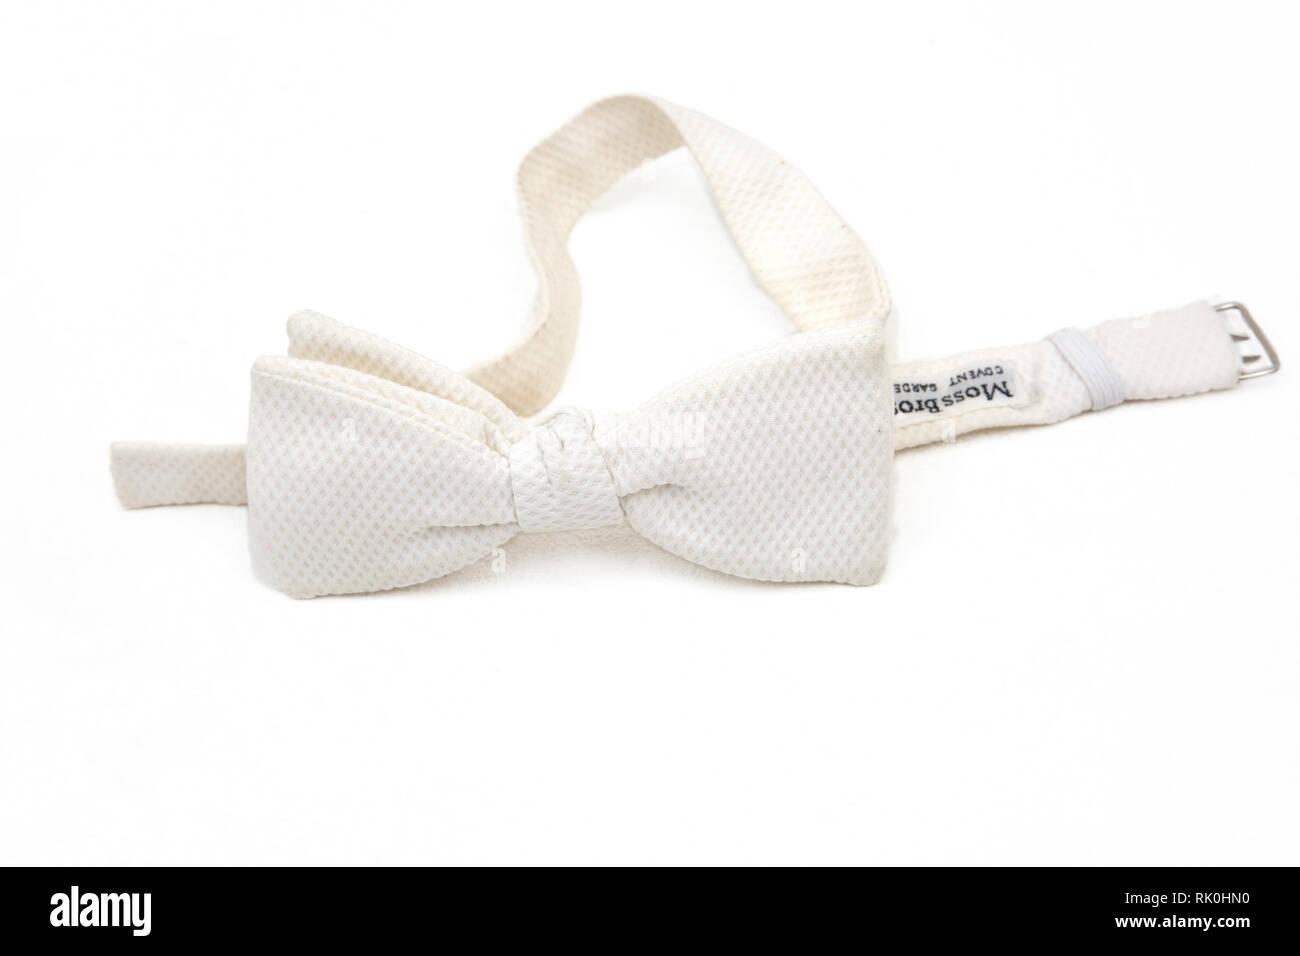 Moss Boss White Bow Tie - Stock Image